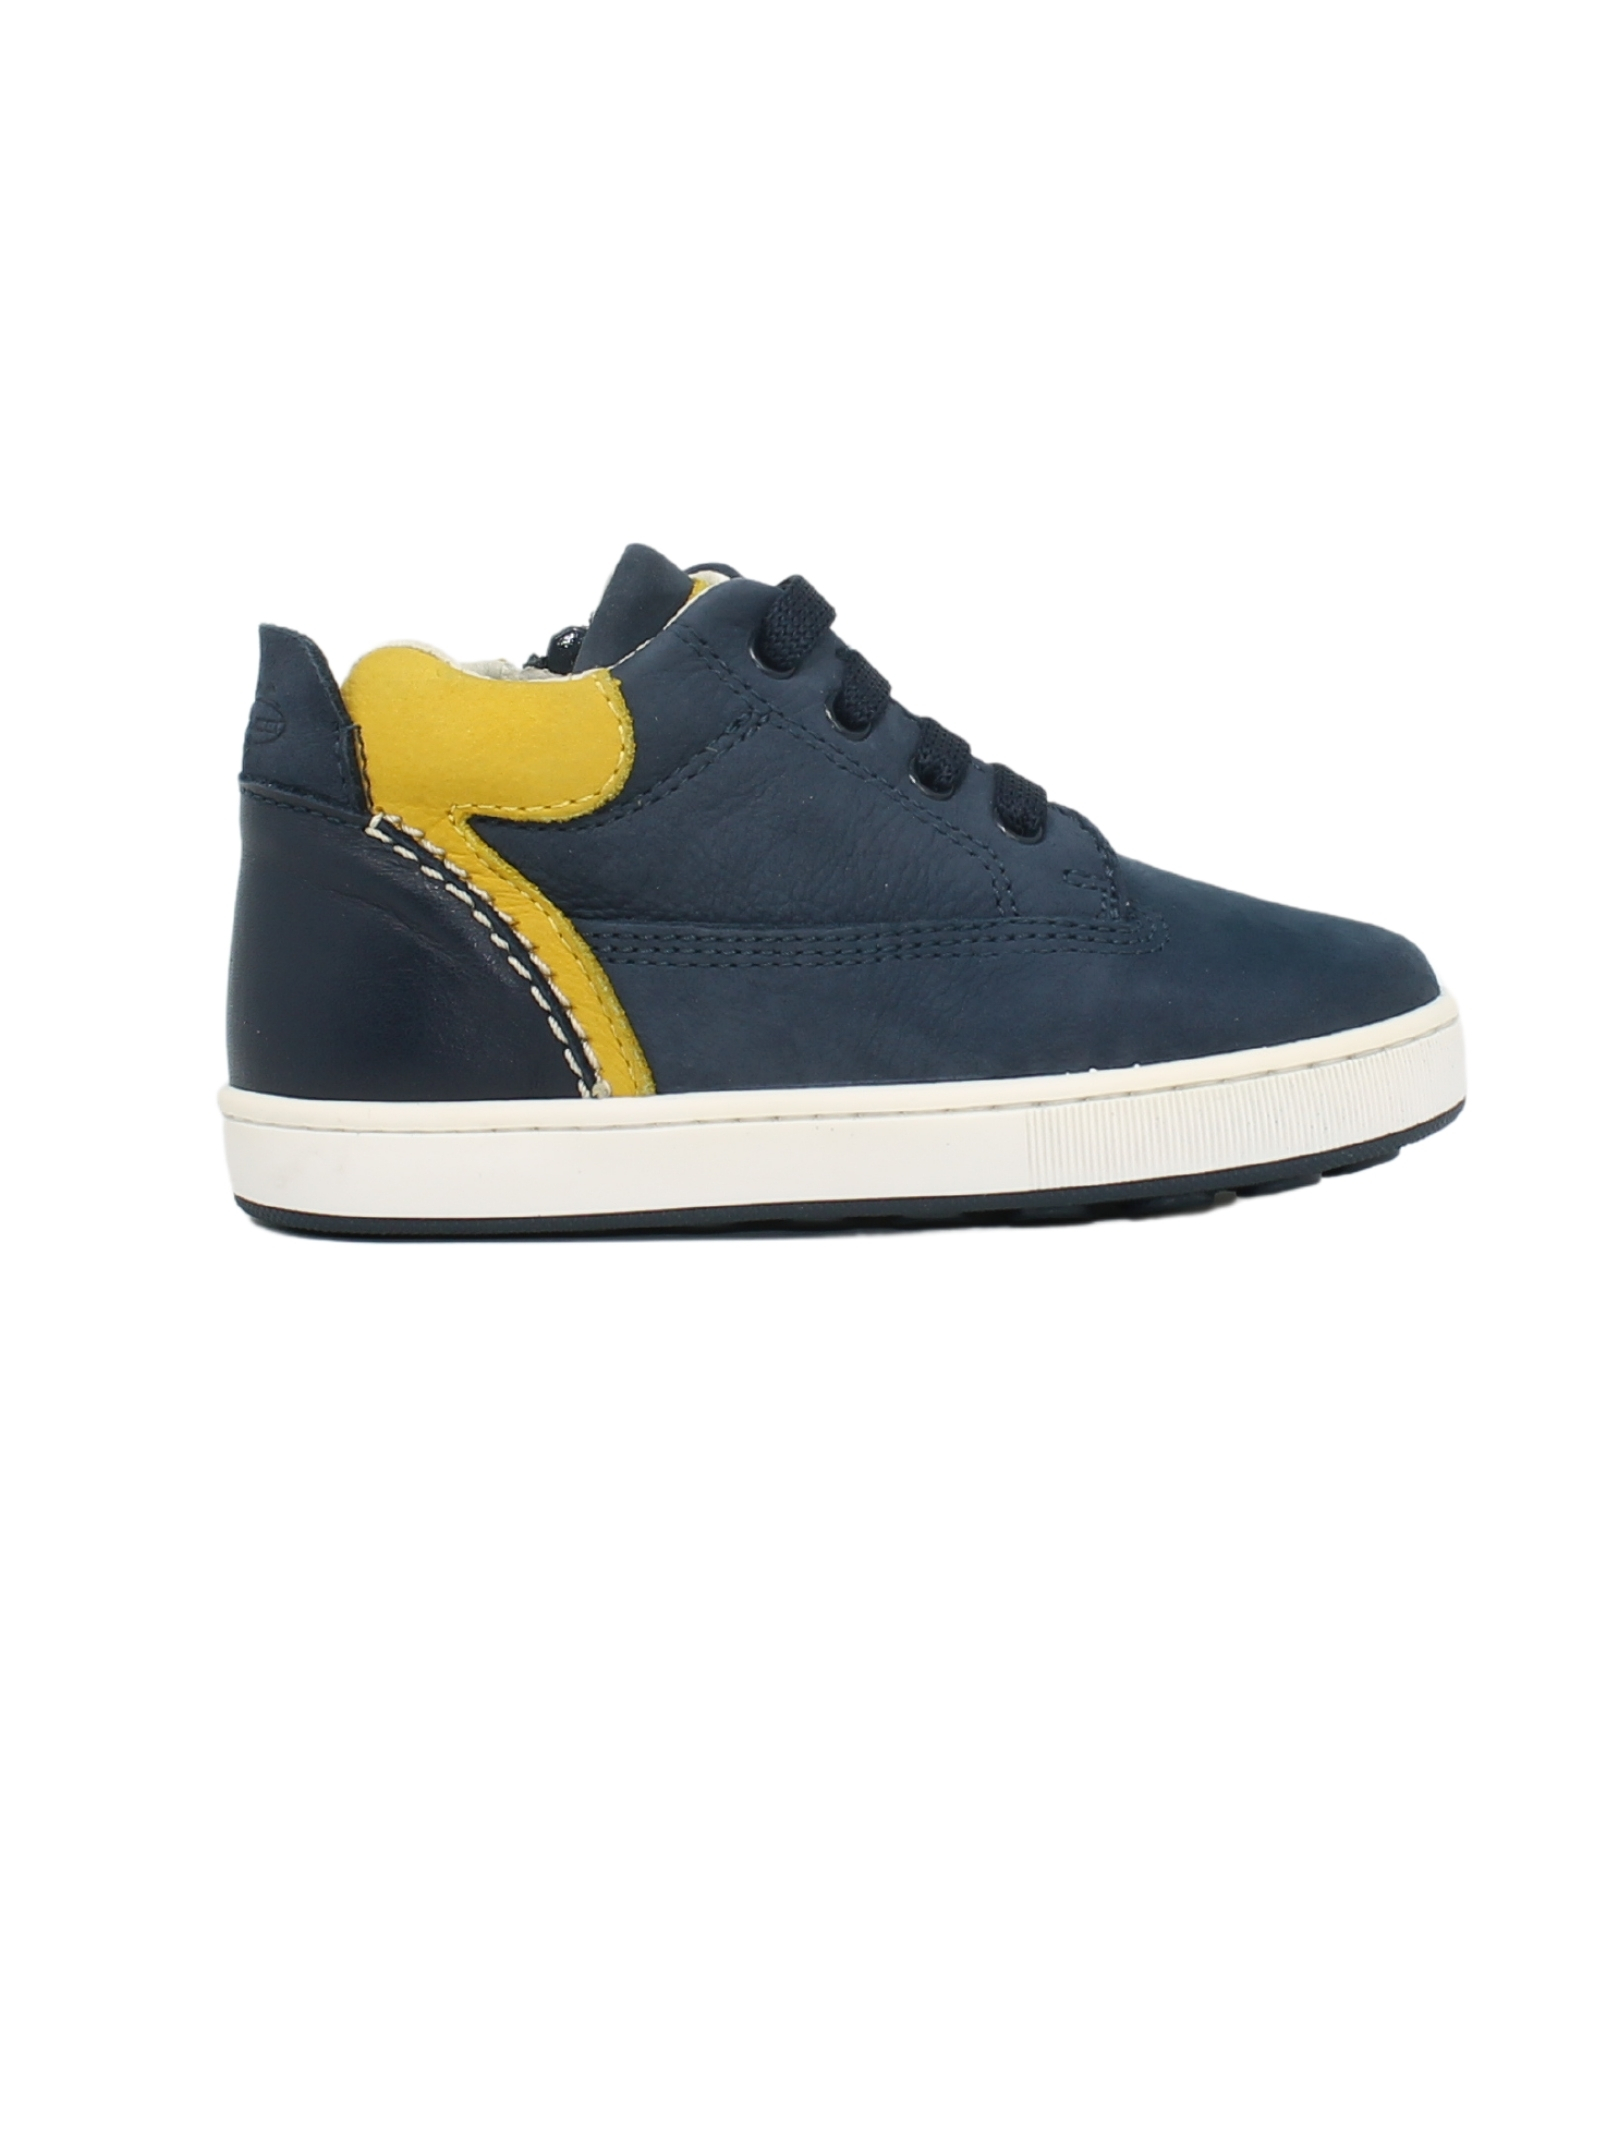 Sneakers Scamosciata Bambino BALDUCCI | Sneakers | CSPO4900BLU